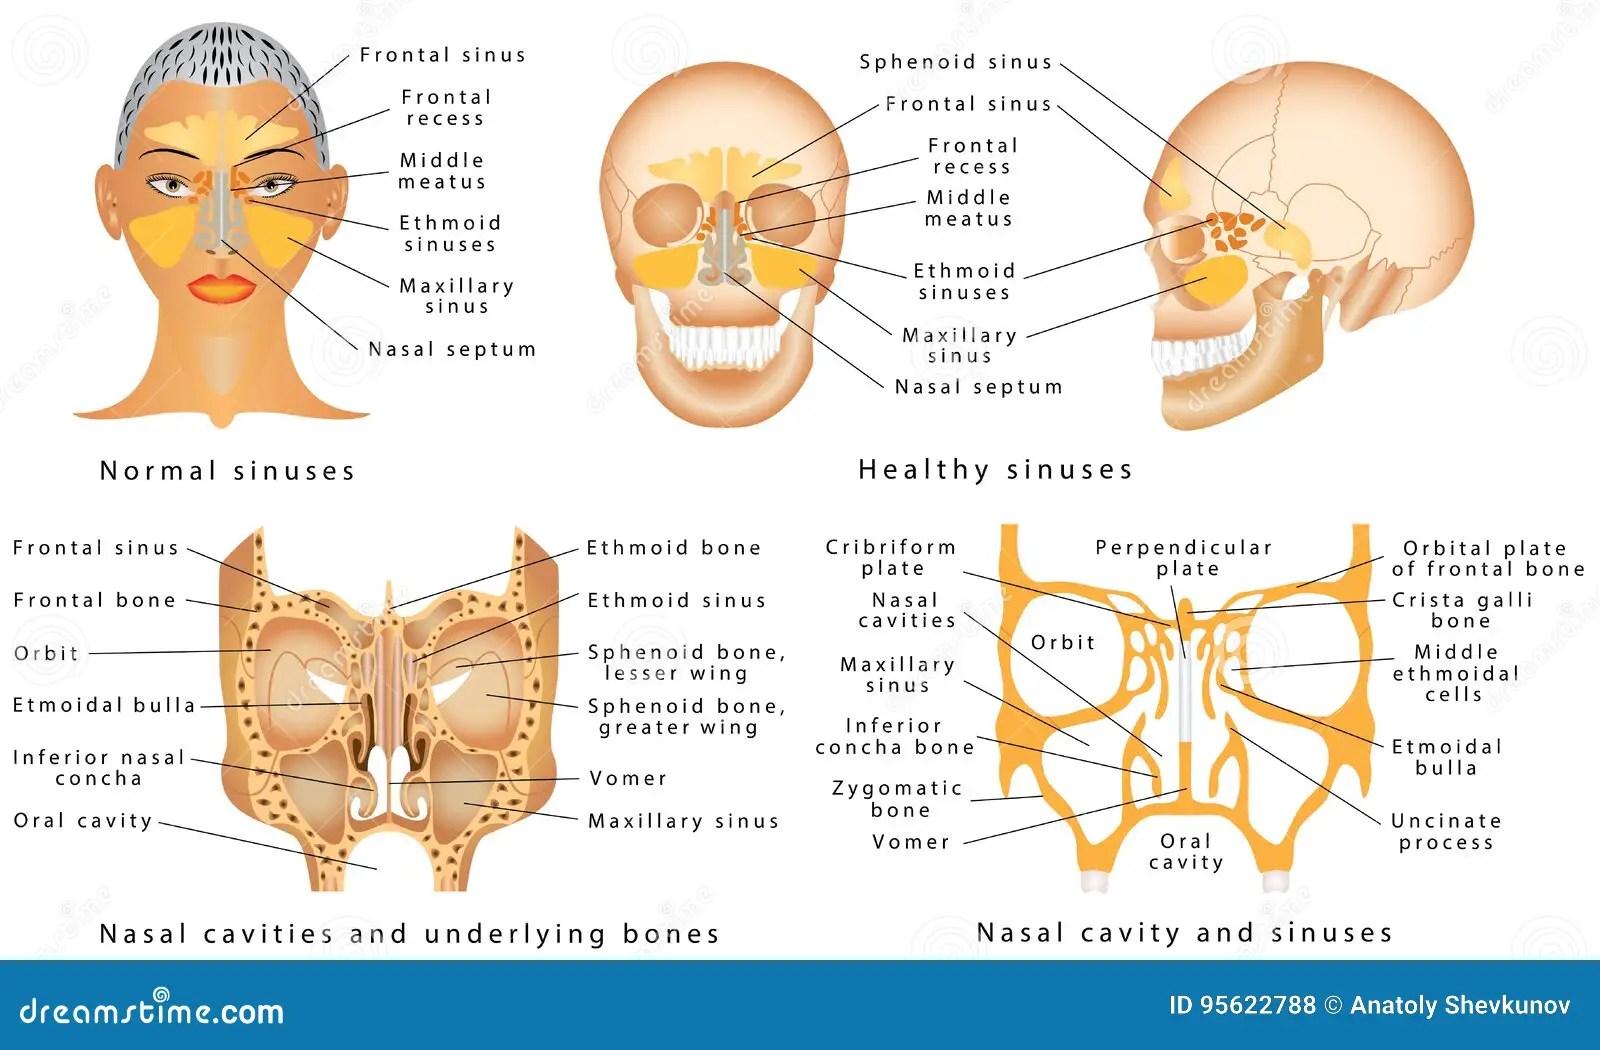 hight resolution of human anatomy sinus diagram anatomy of the nose nasal cavity bones anatomy of paranasal sinuses sinusitis it is the inflammation of the maxillary